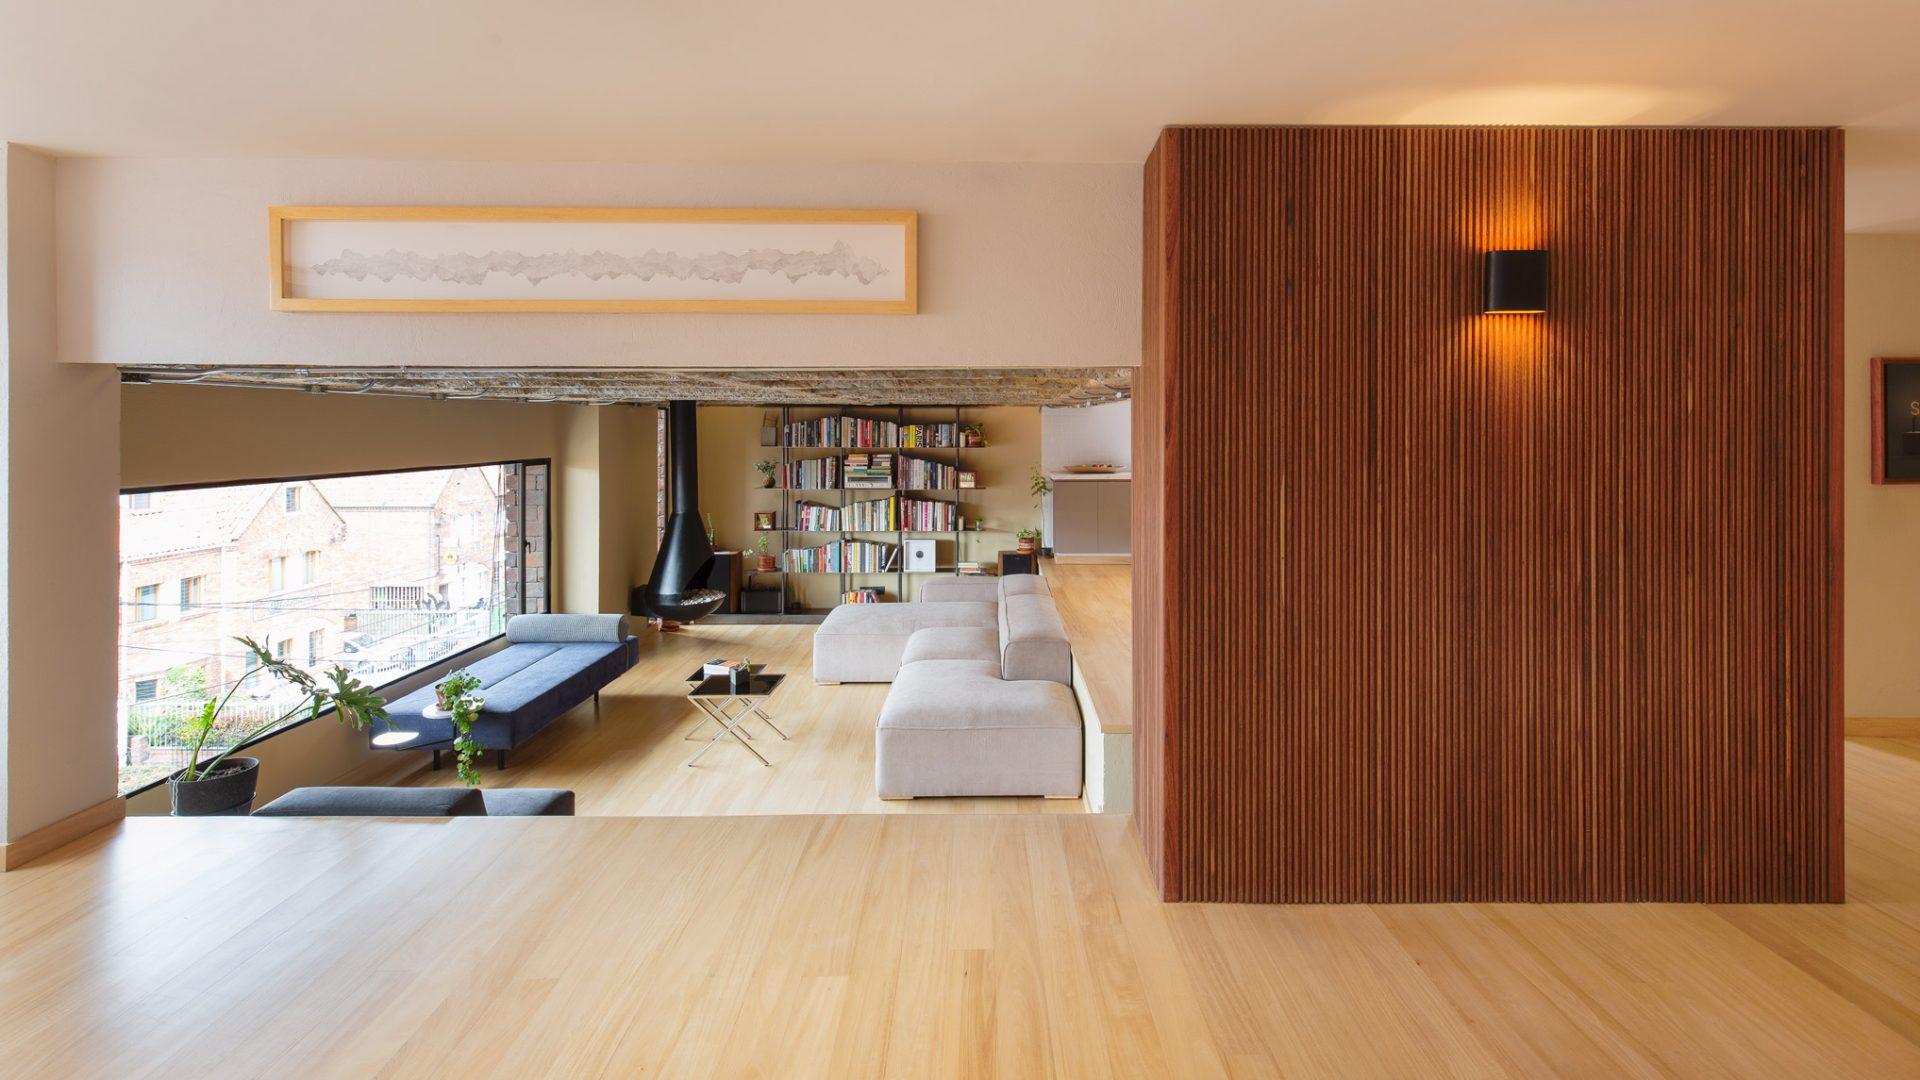 06.MLS_arquitectura_taller_tragaluz_interior_dutch_bogota_colombia_simon_bosch_photography